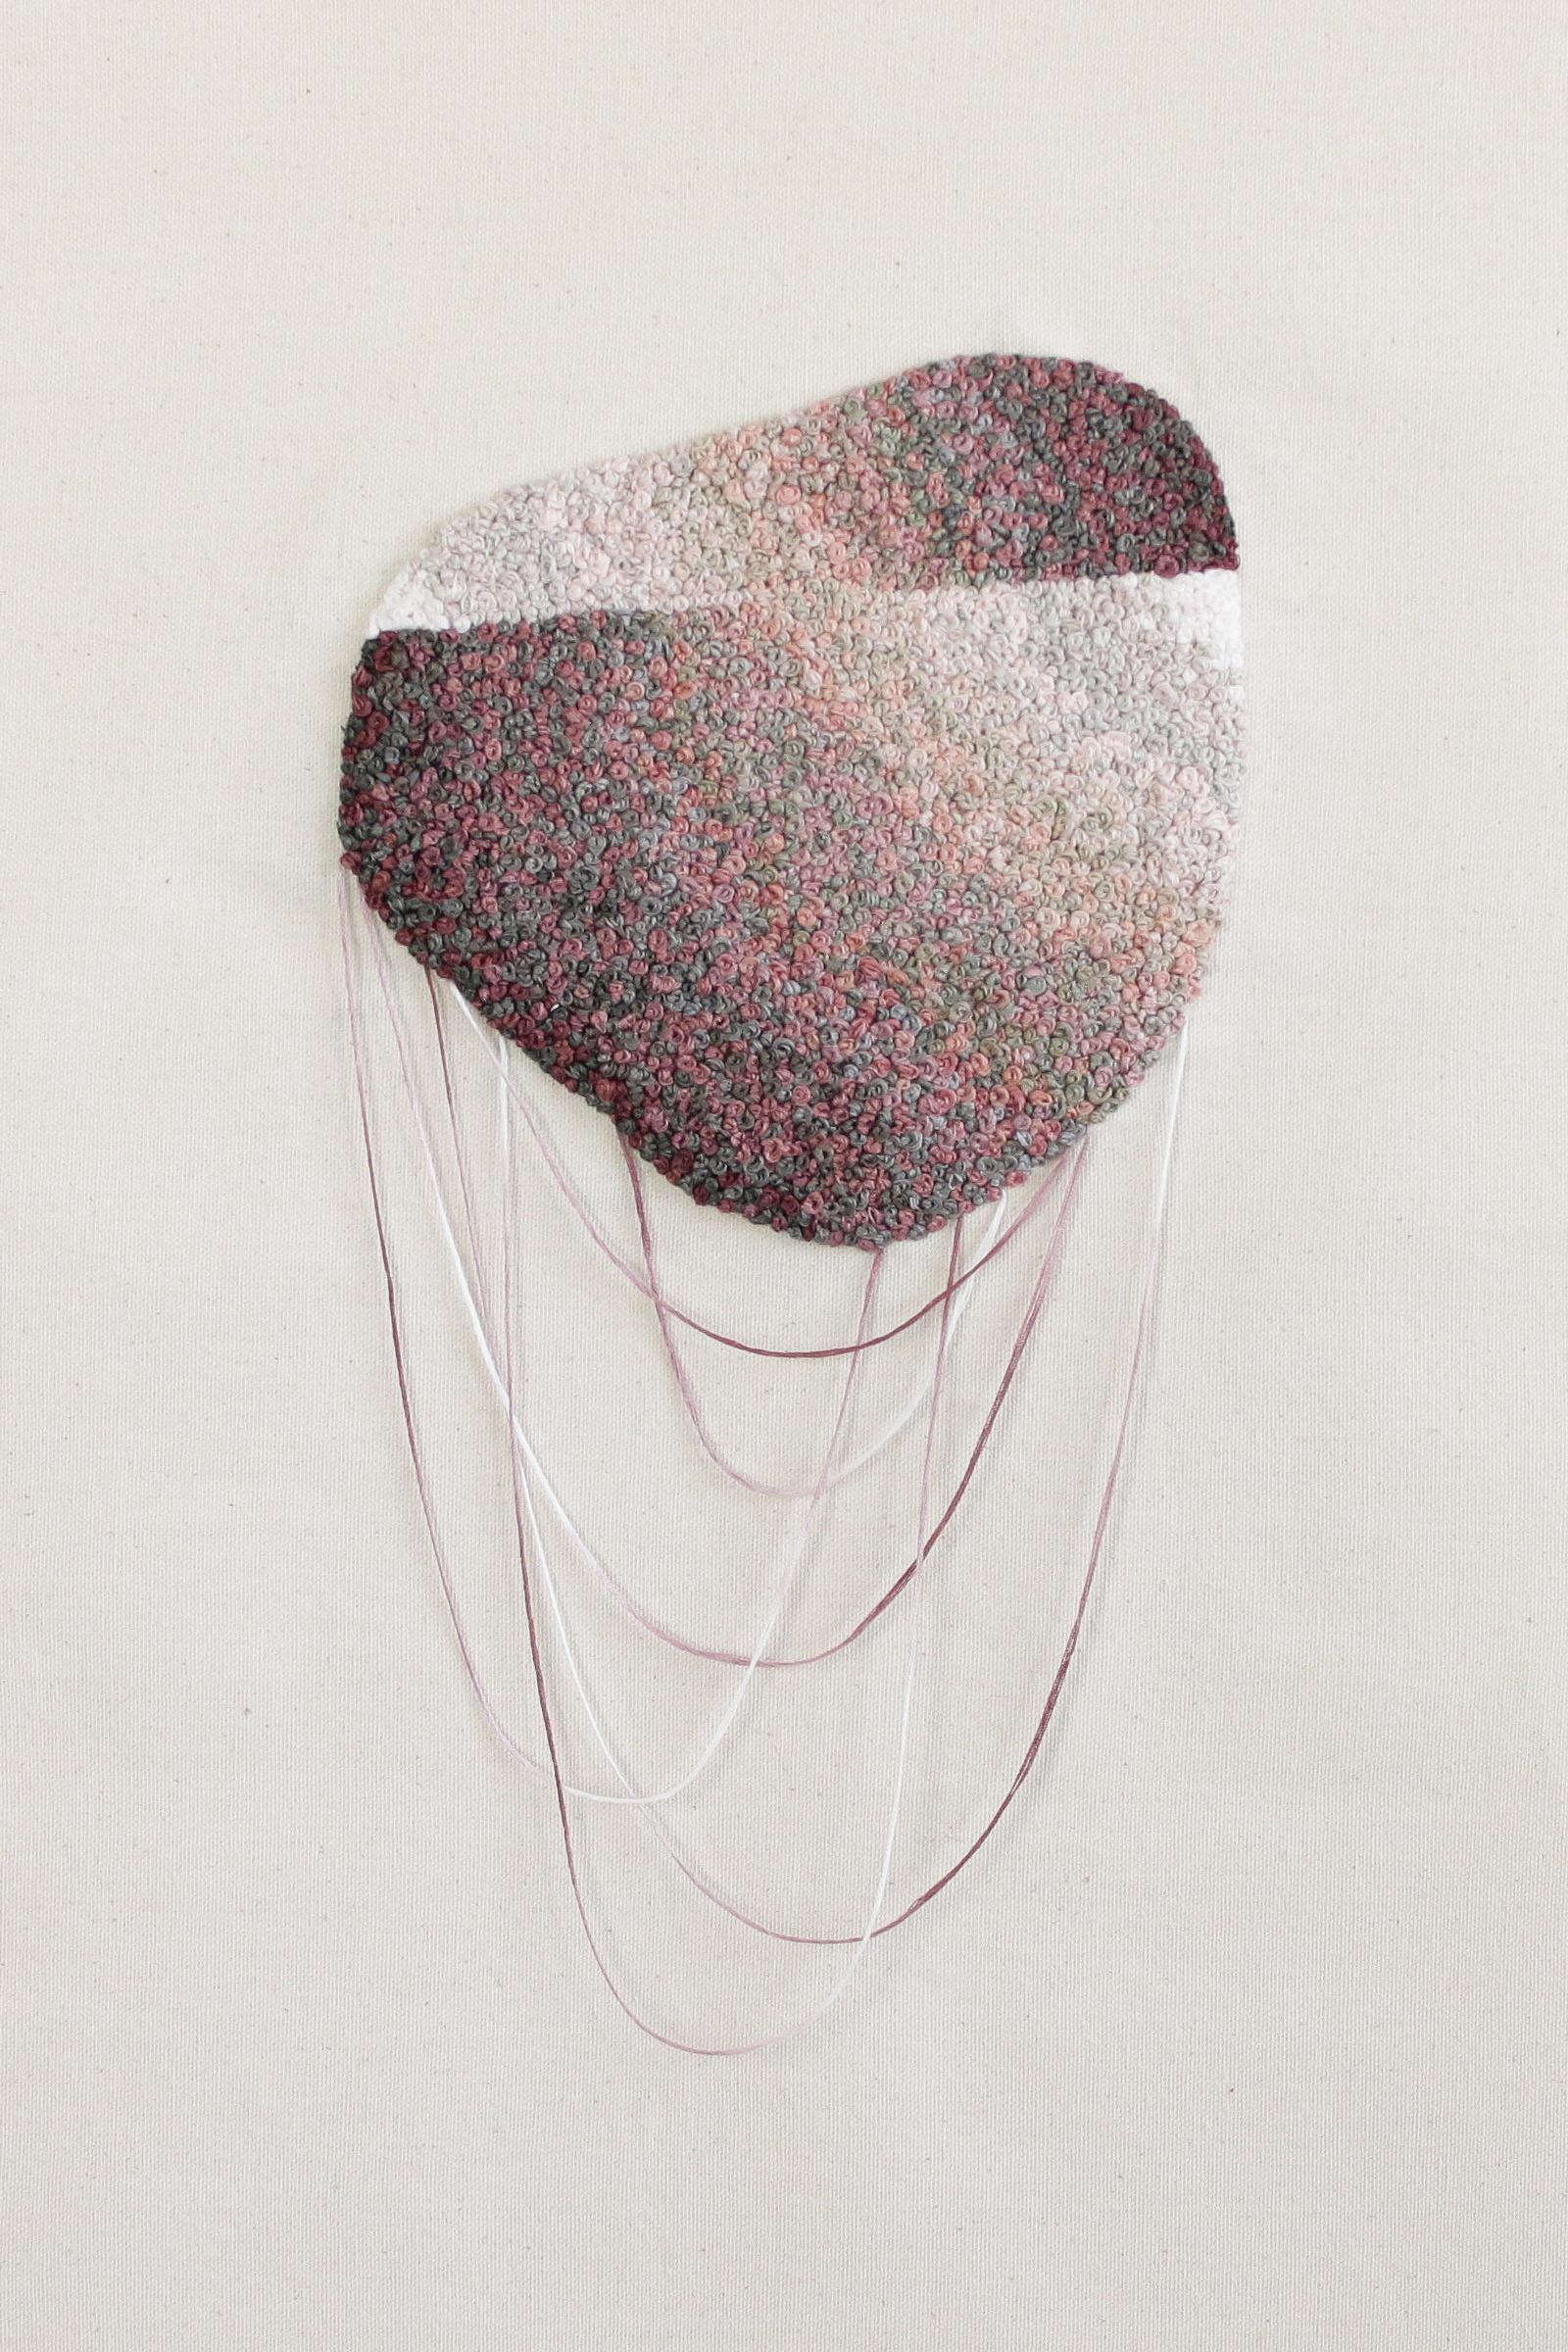 Aly Barohn- Pull No.3 Detail.jpg